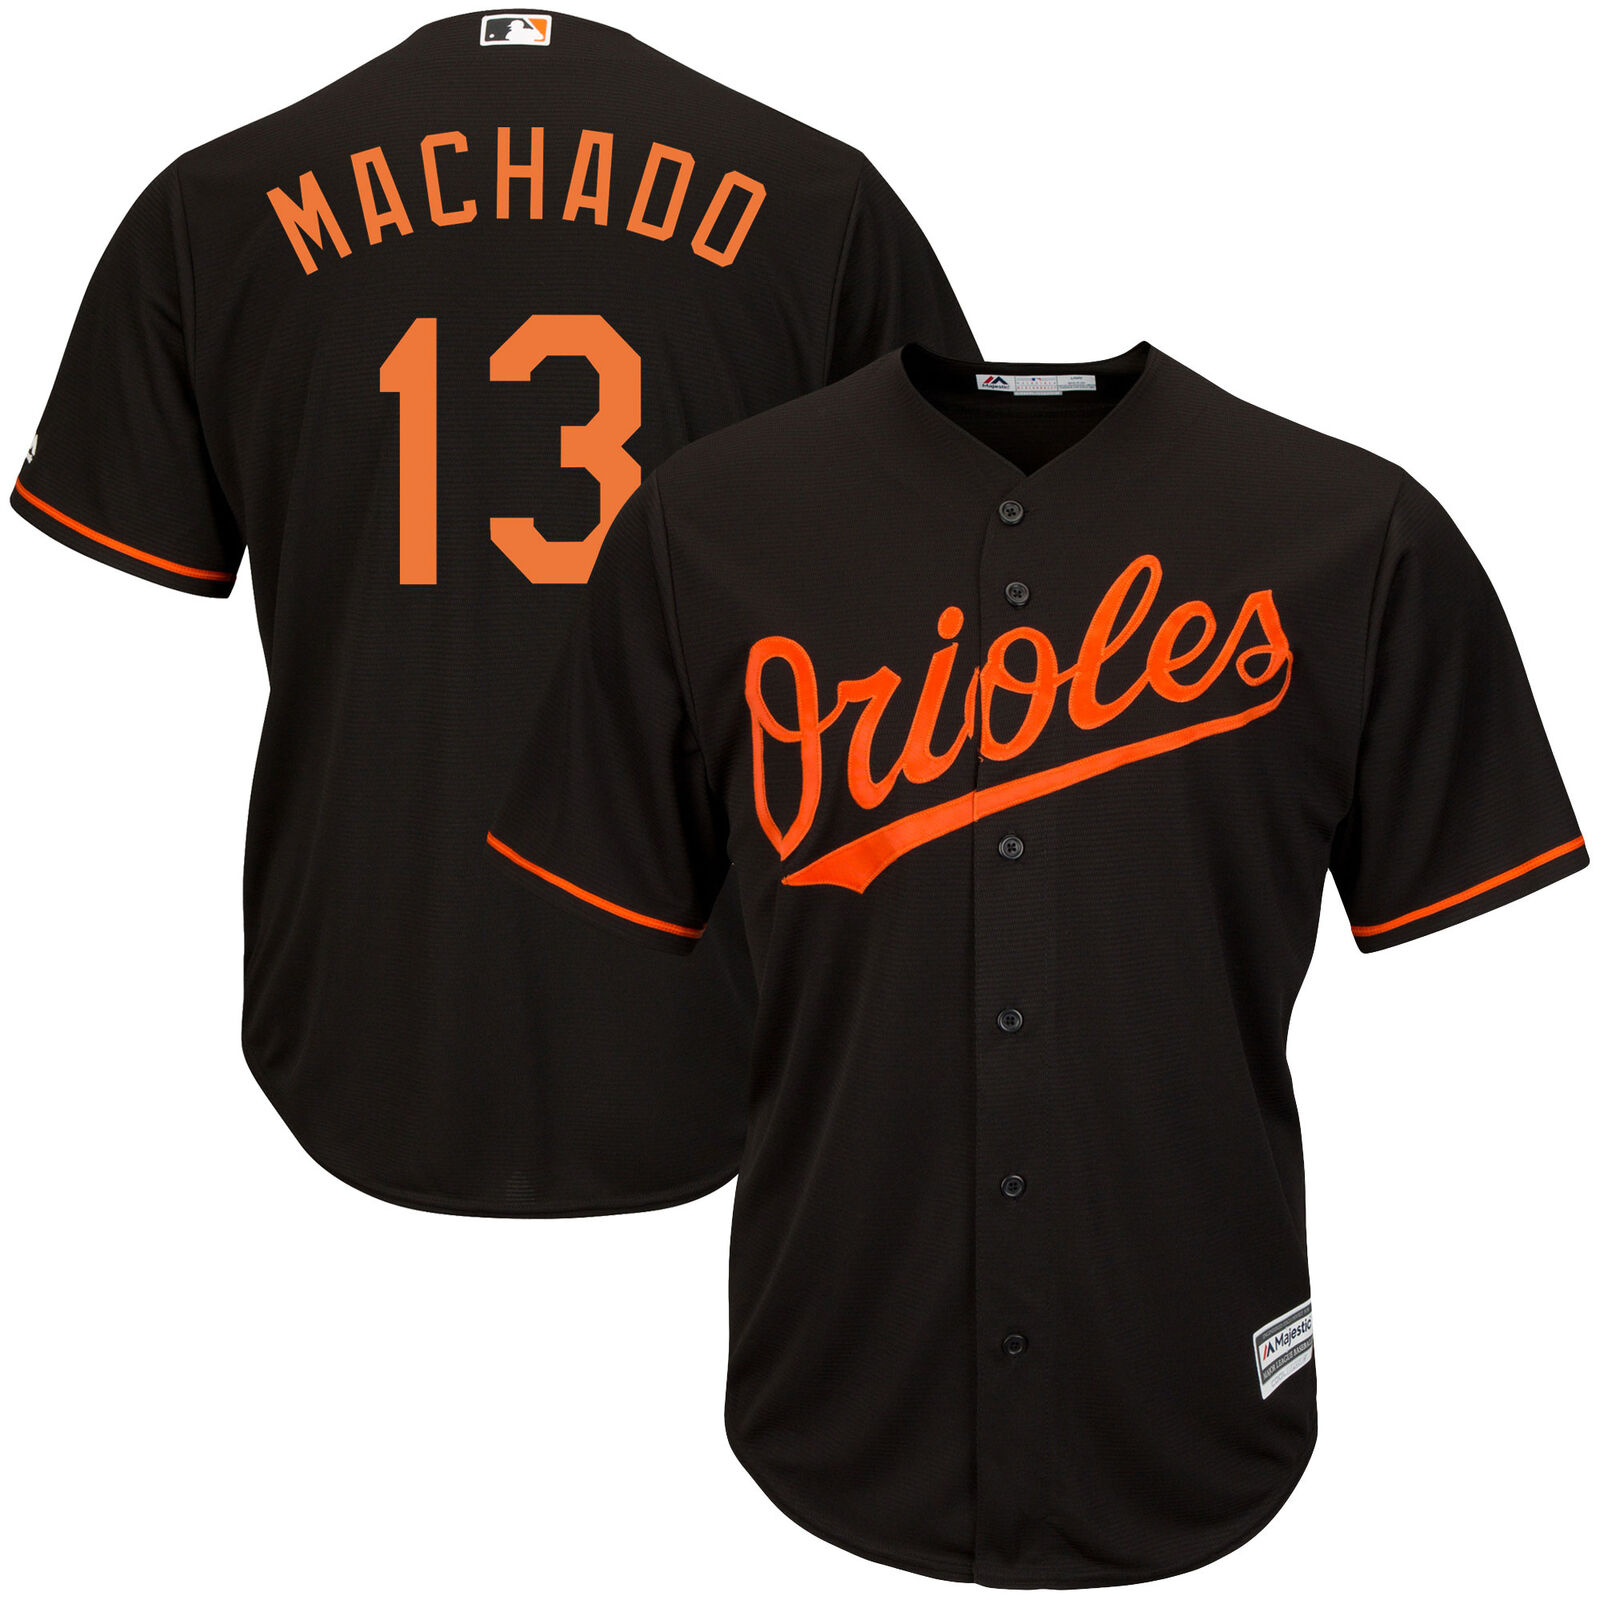 MLB Baltimore Orioles Majestic Replik Cool Base Wechsel Trikot Shirt Herren